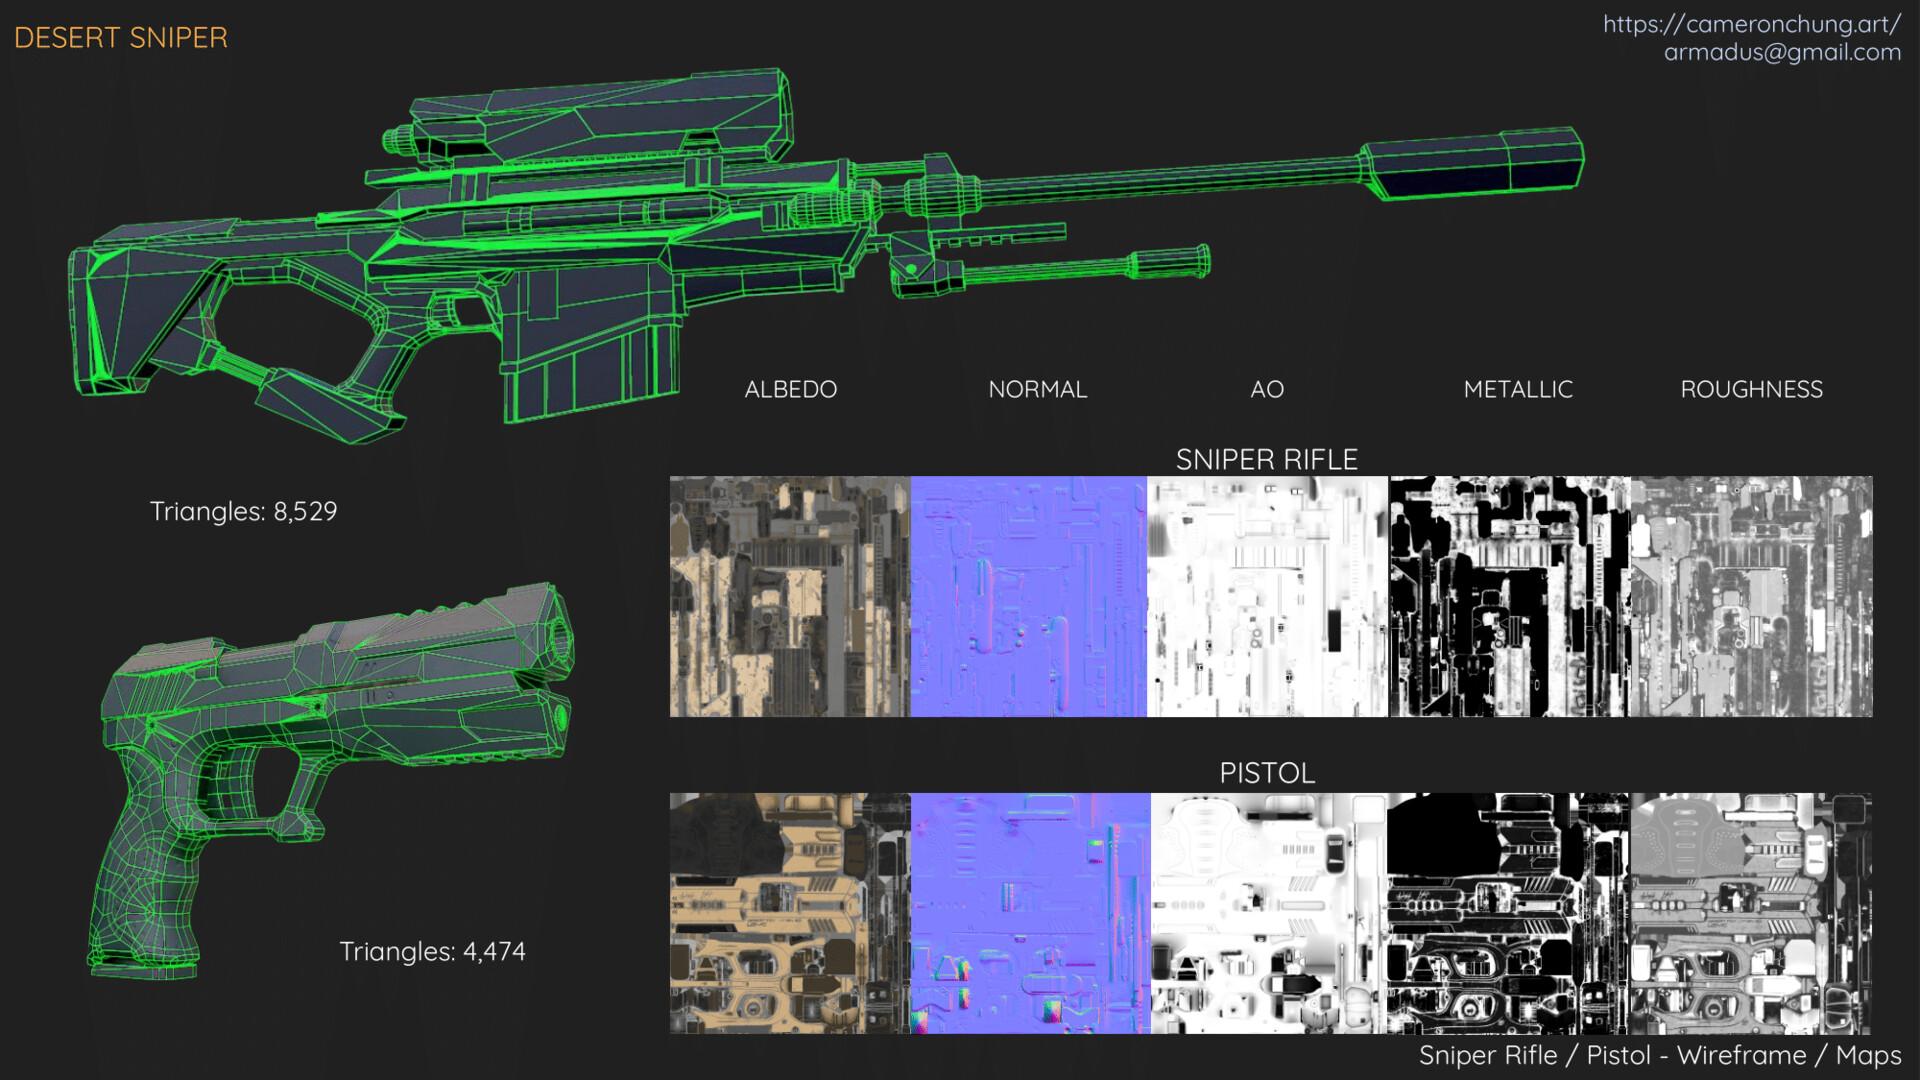 Sniper Rifle / Pistol - Wireframe / Maps